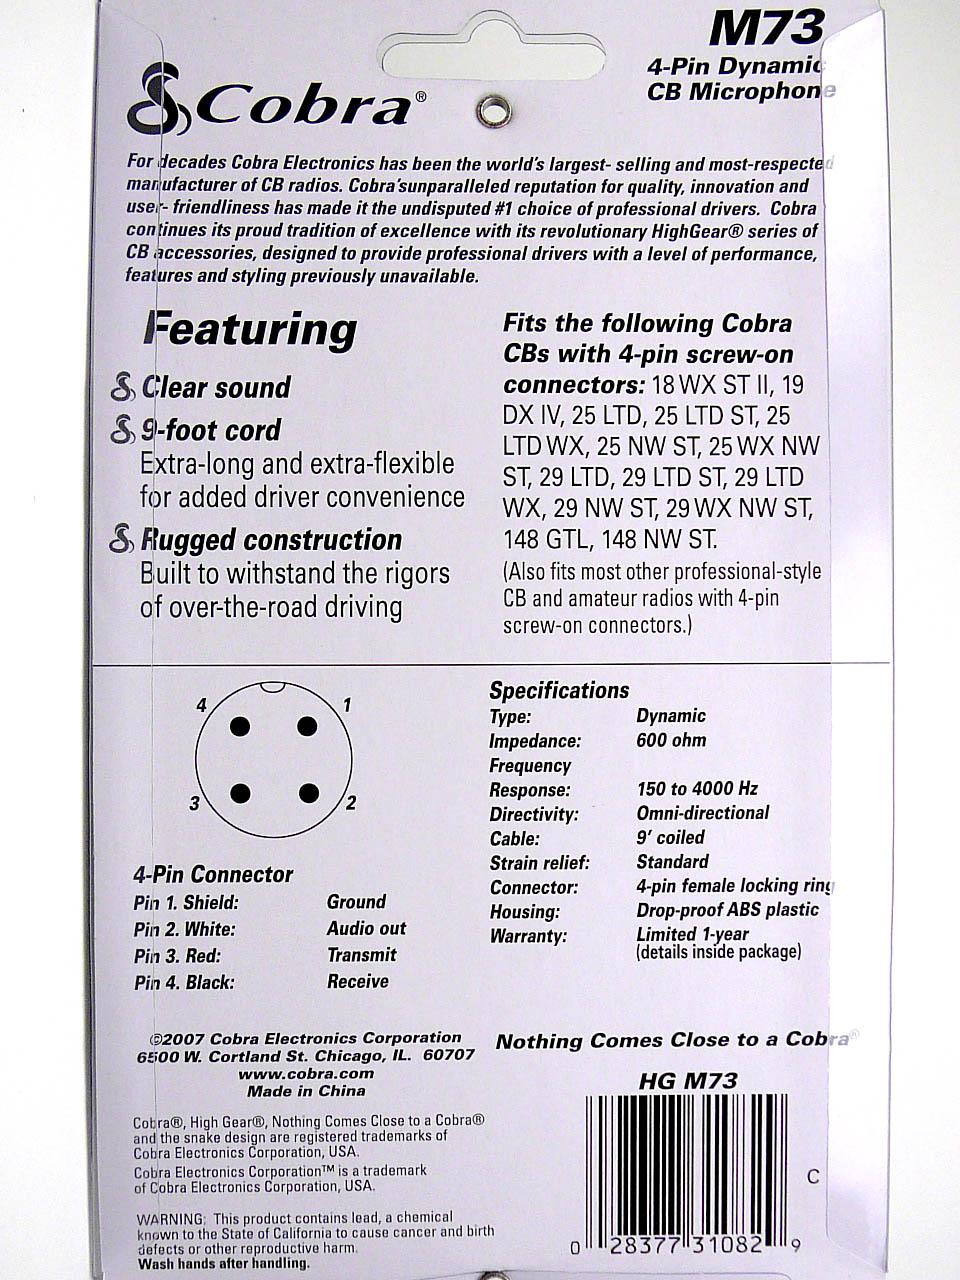 cobra hg m73 70 series cb radio microphone 28377310829 ebay